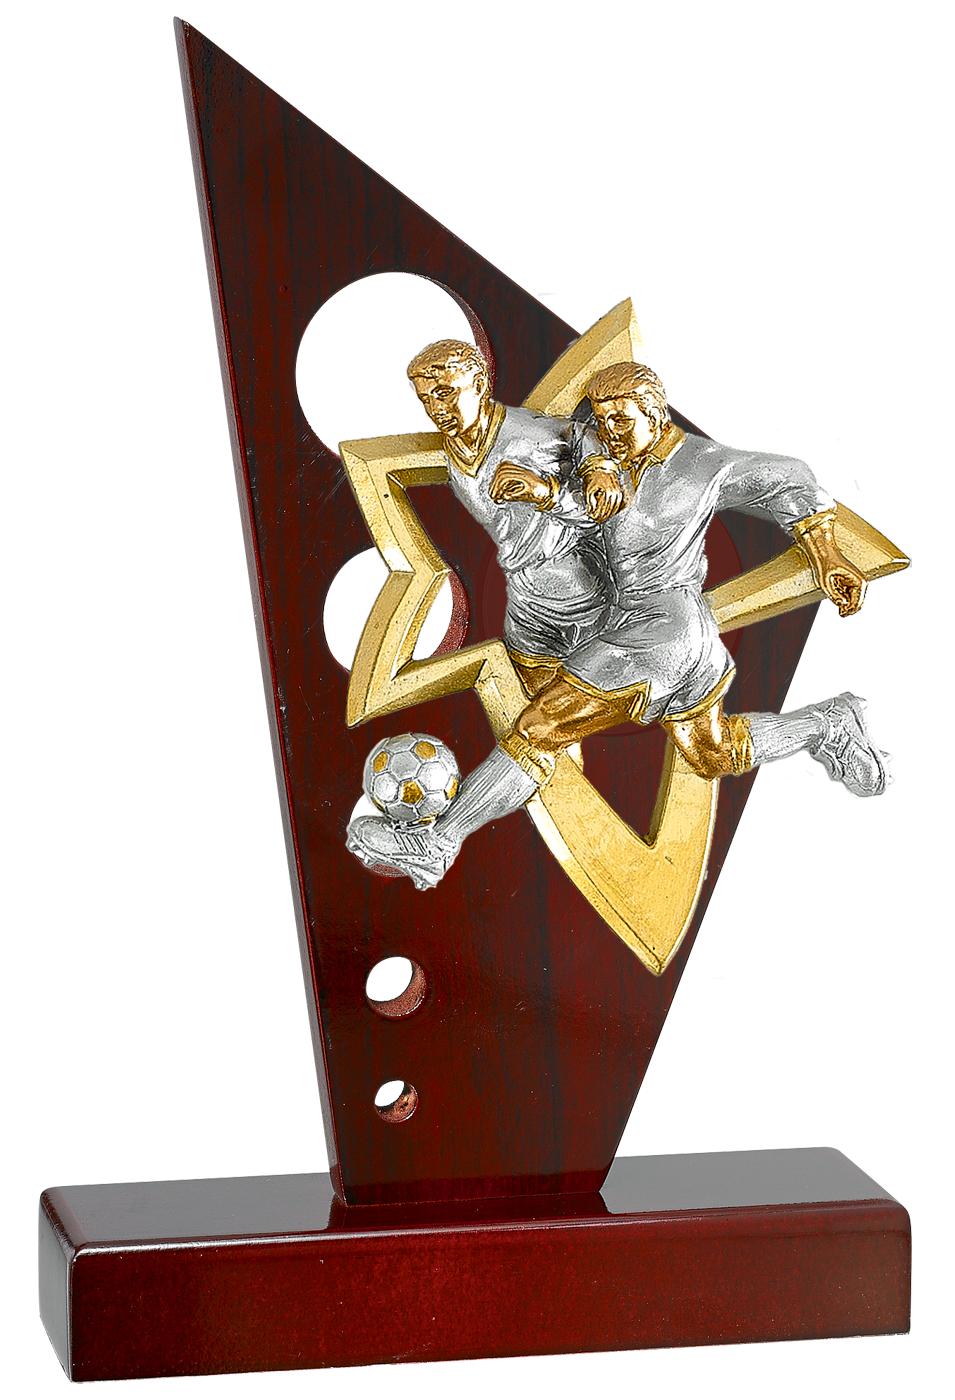 Holzpokal Trophäe Fußball 3er Serie  21-25cm Pokale Pokale ohne Deckel